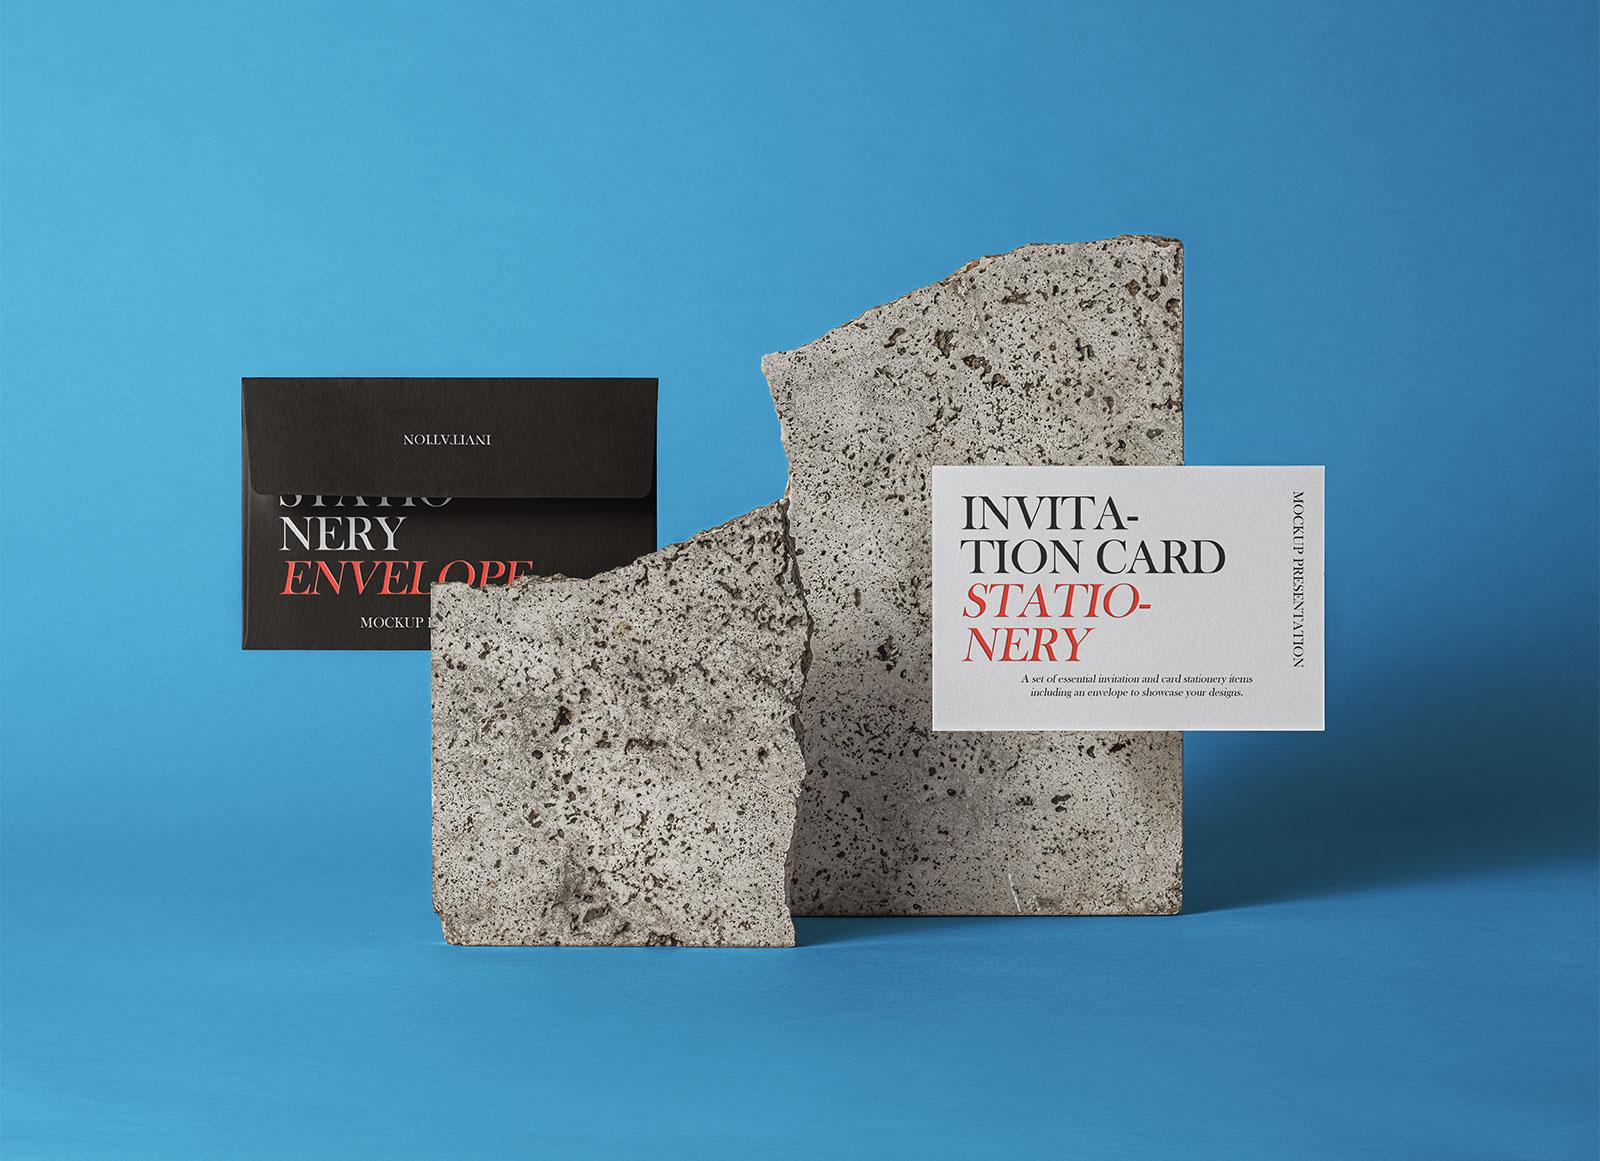 Free-Invitation-Card-&-Envelop-Presentation-Mockup-PSD